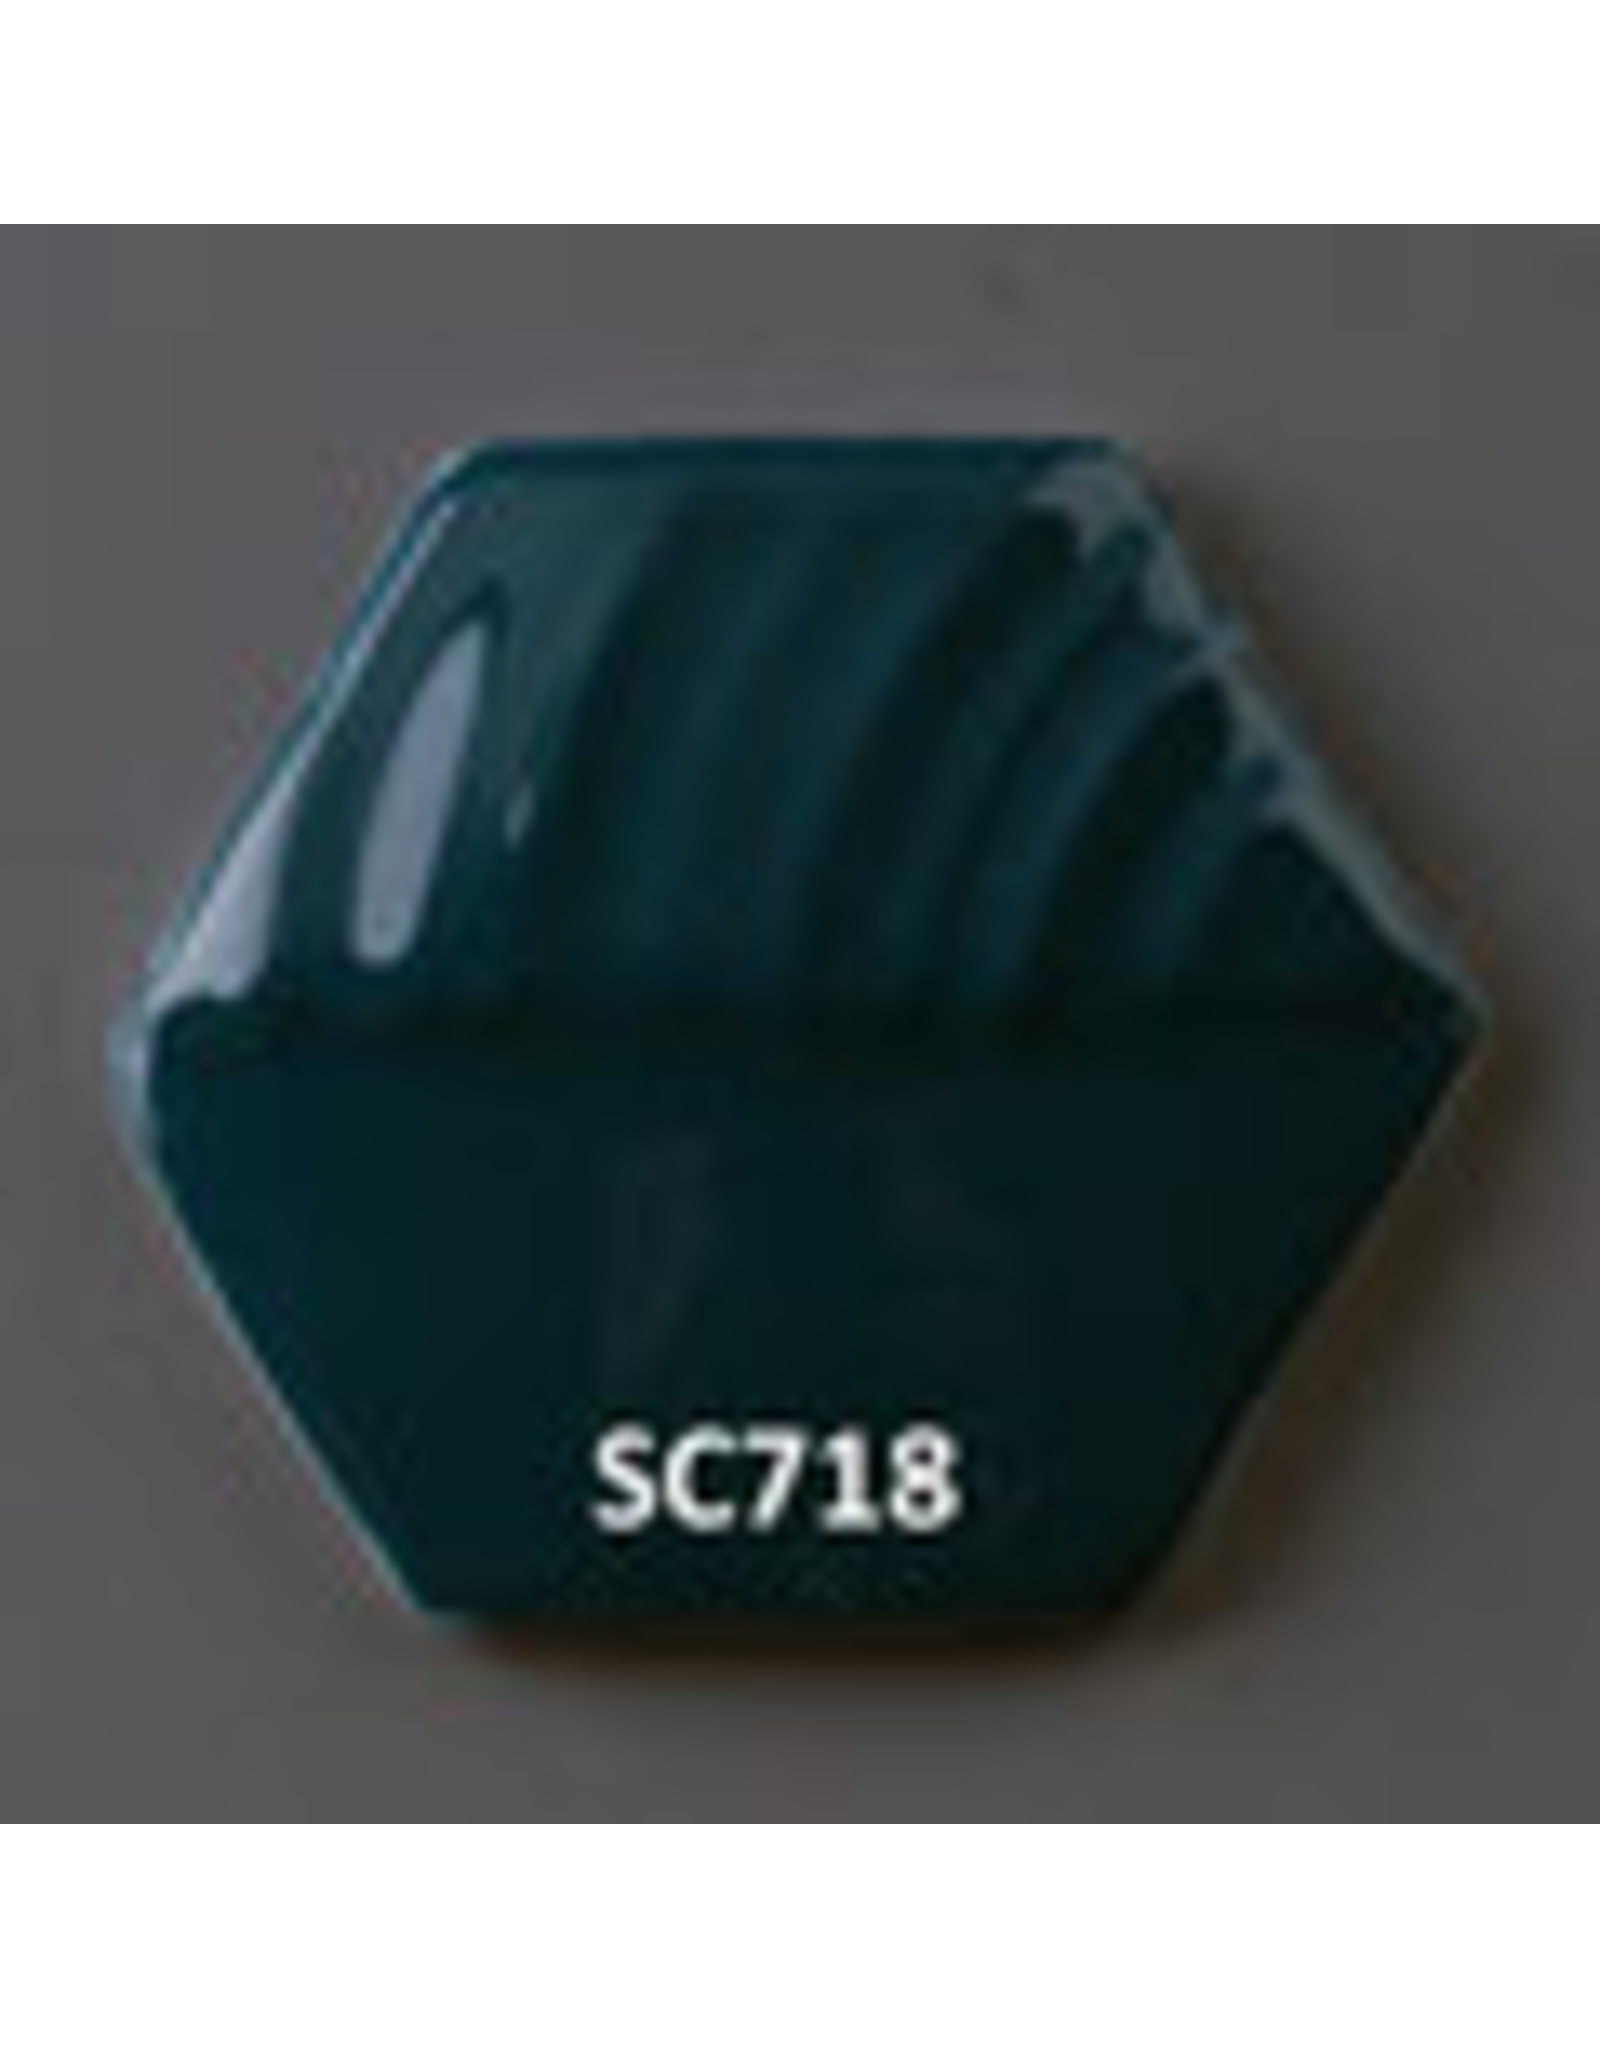 Sneyd Forest Green (Cr,Co,Zn,Al) Glaze Stain